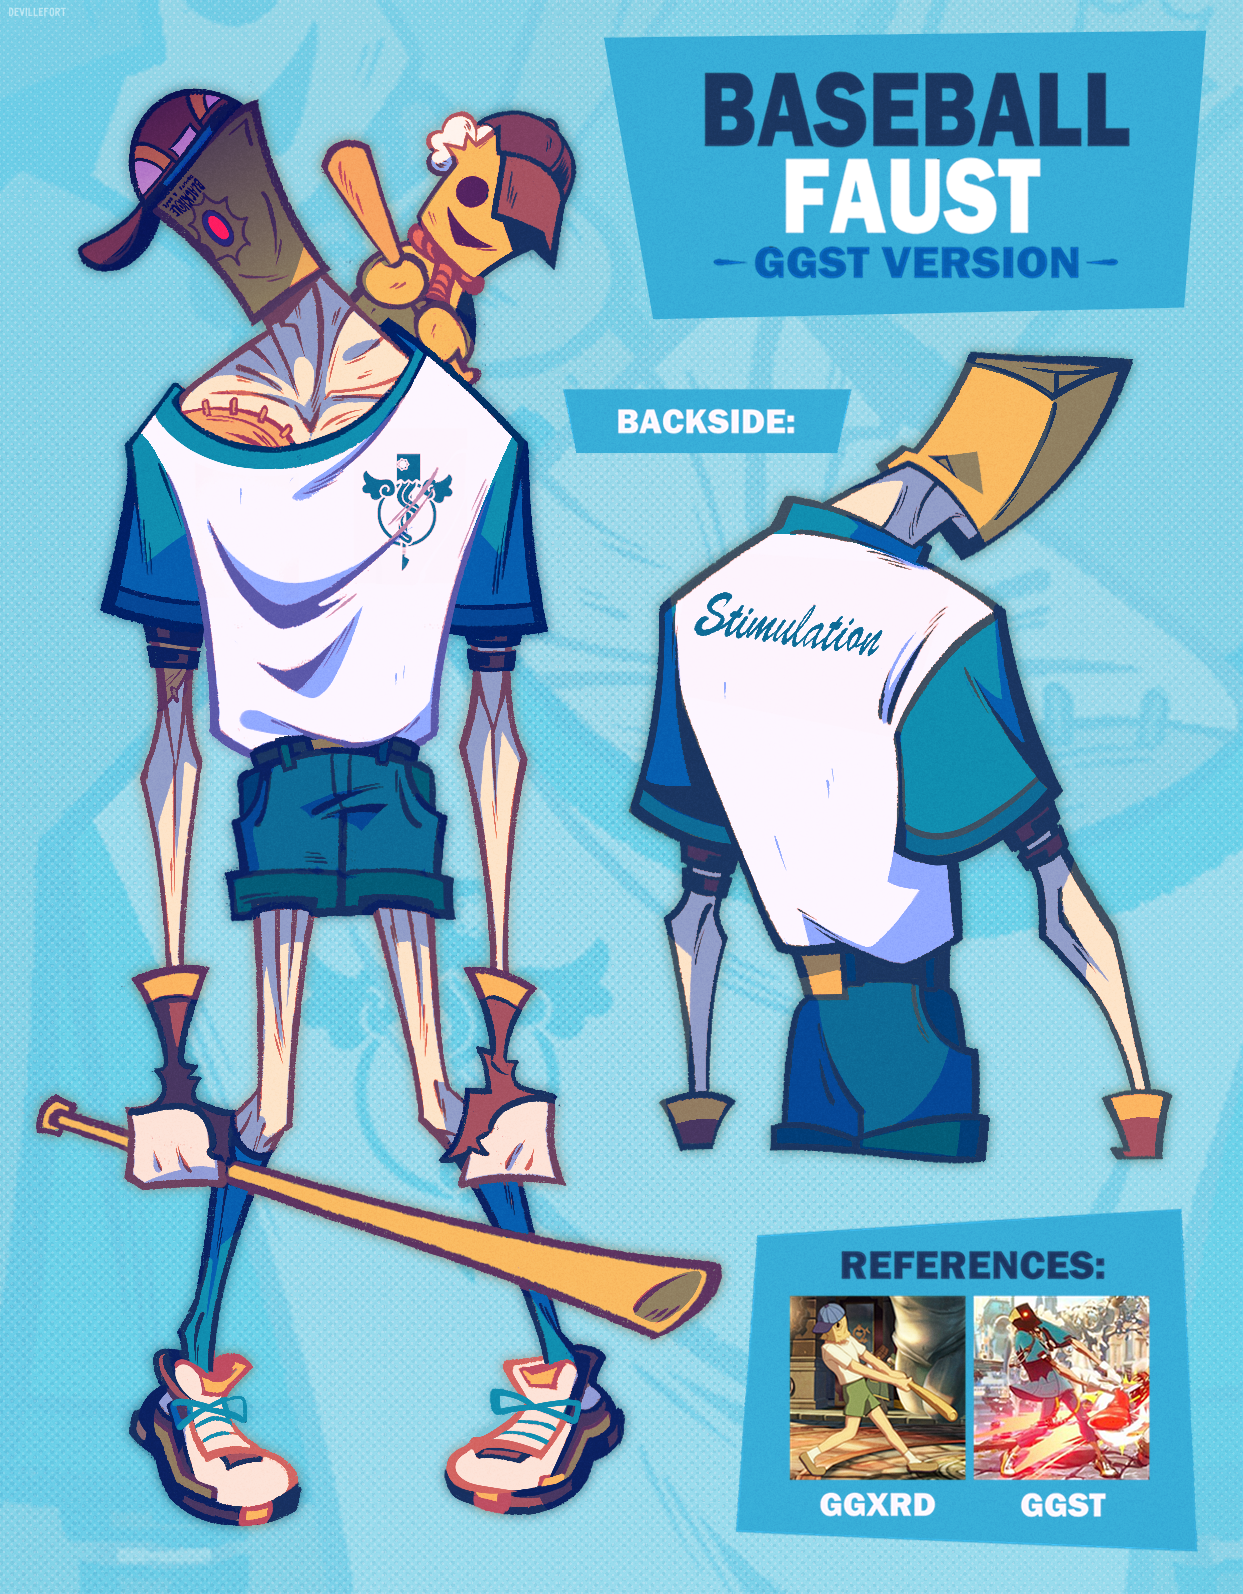 Baseball Faust (GGST Version)